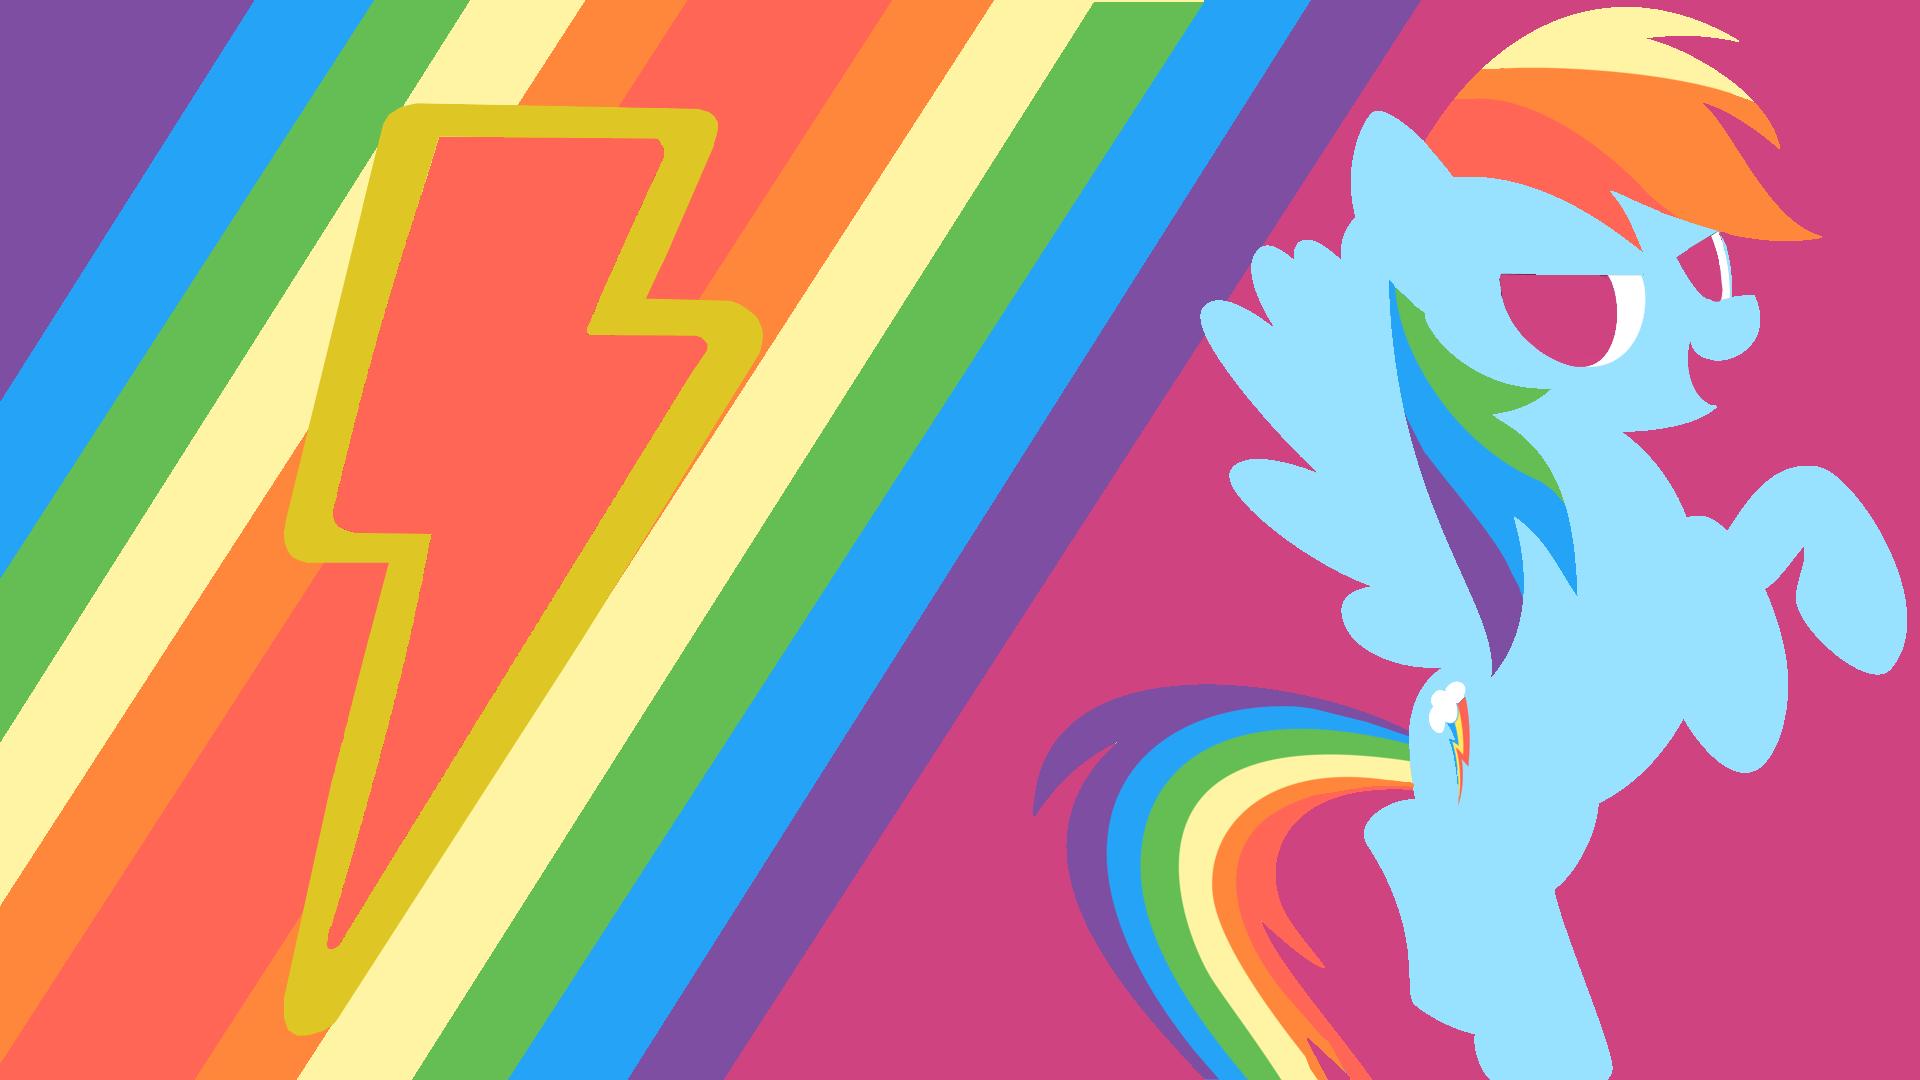 Rainbow Dash's Loyalty Minimalist Wallpaper by Narflarg on deviantART